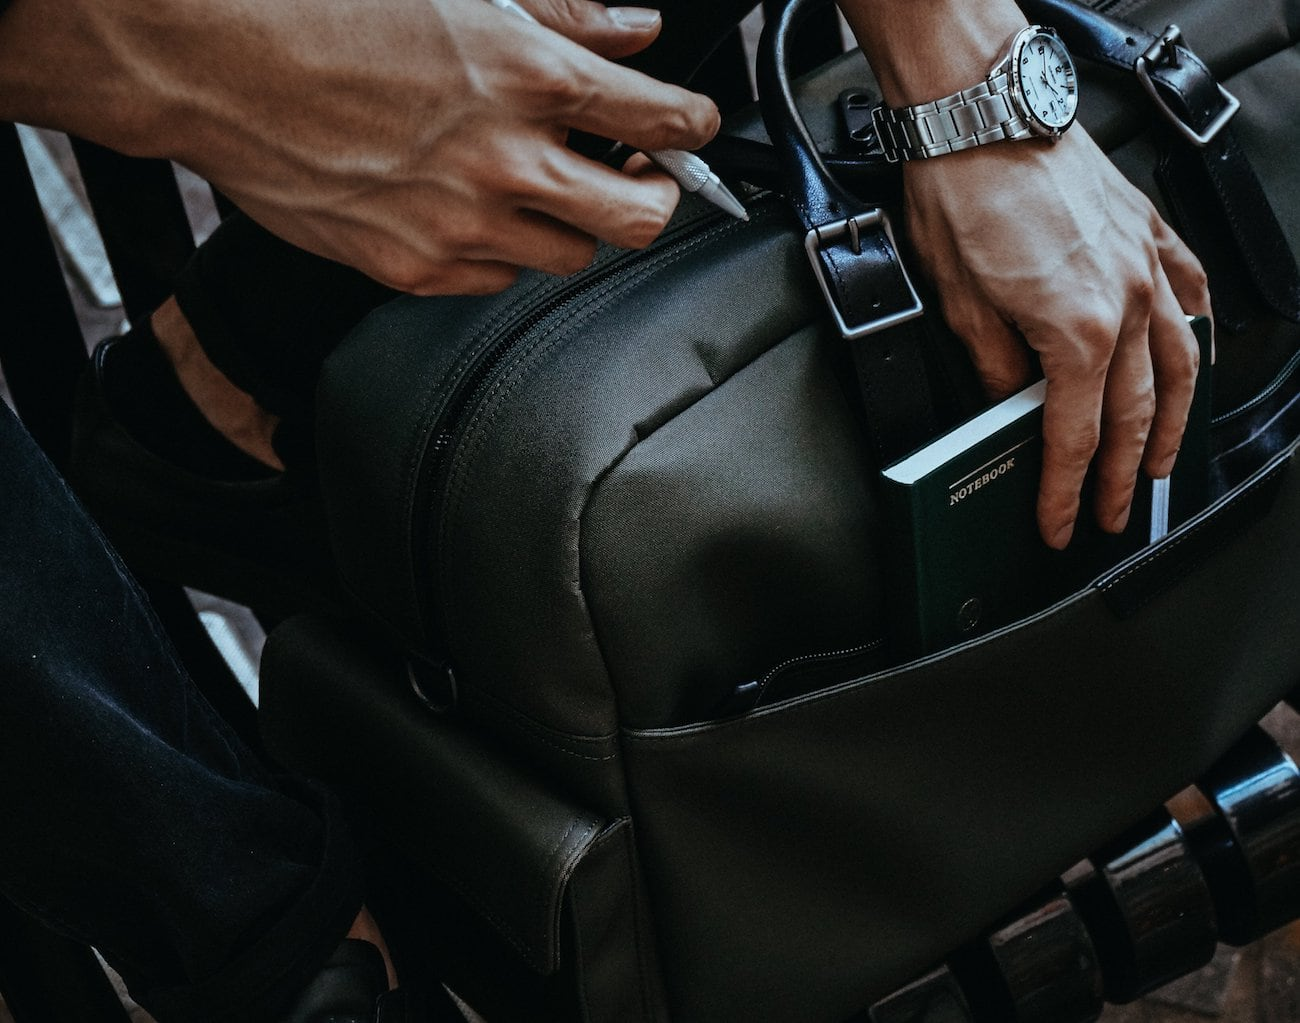 Stuart & Lau Campaign Multipurpose Carryall Bag